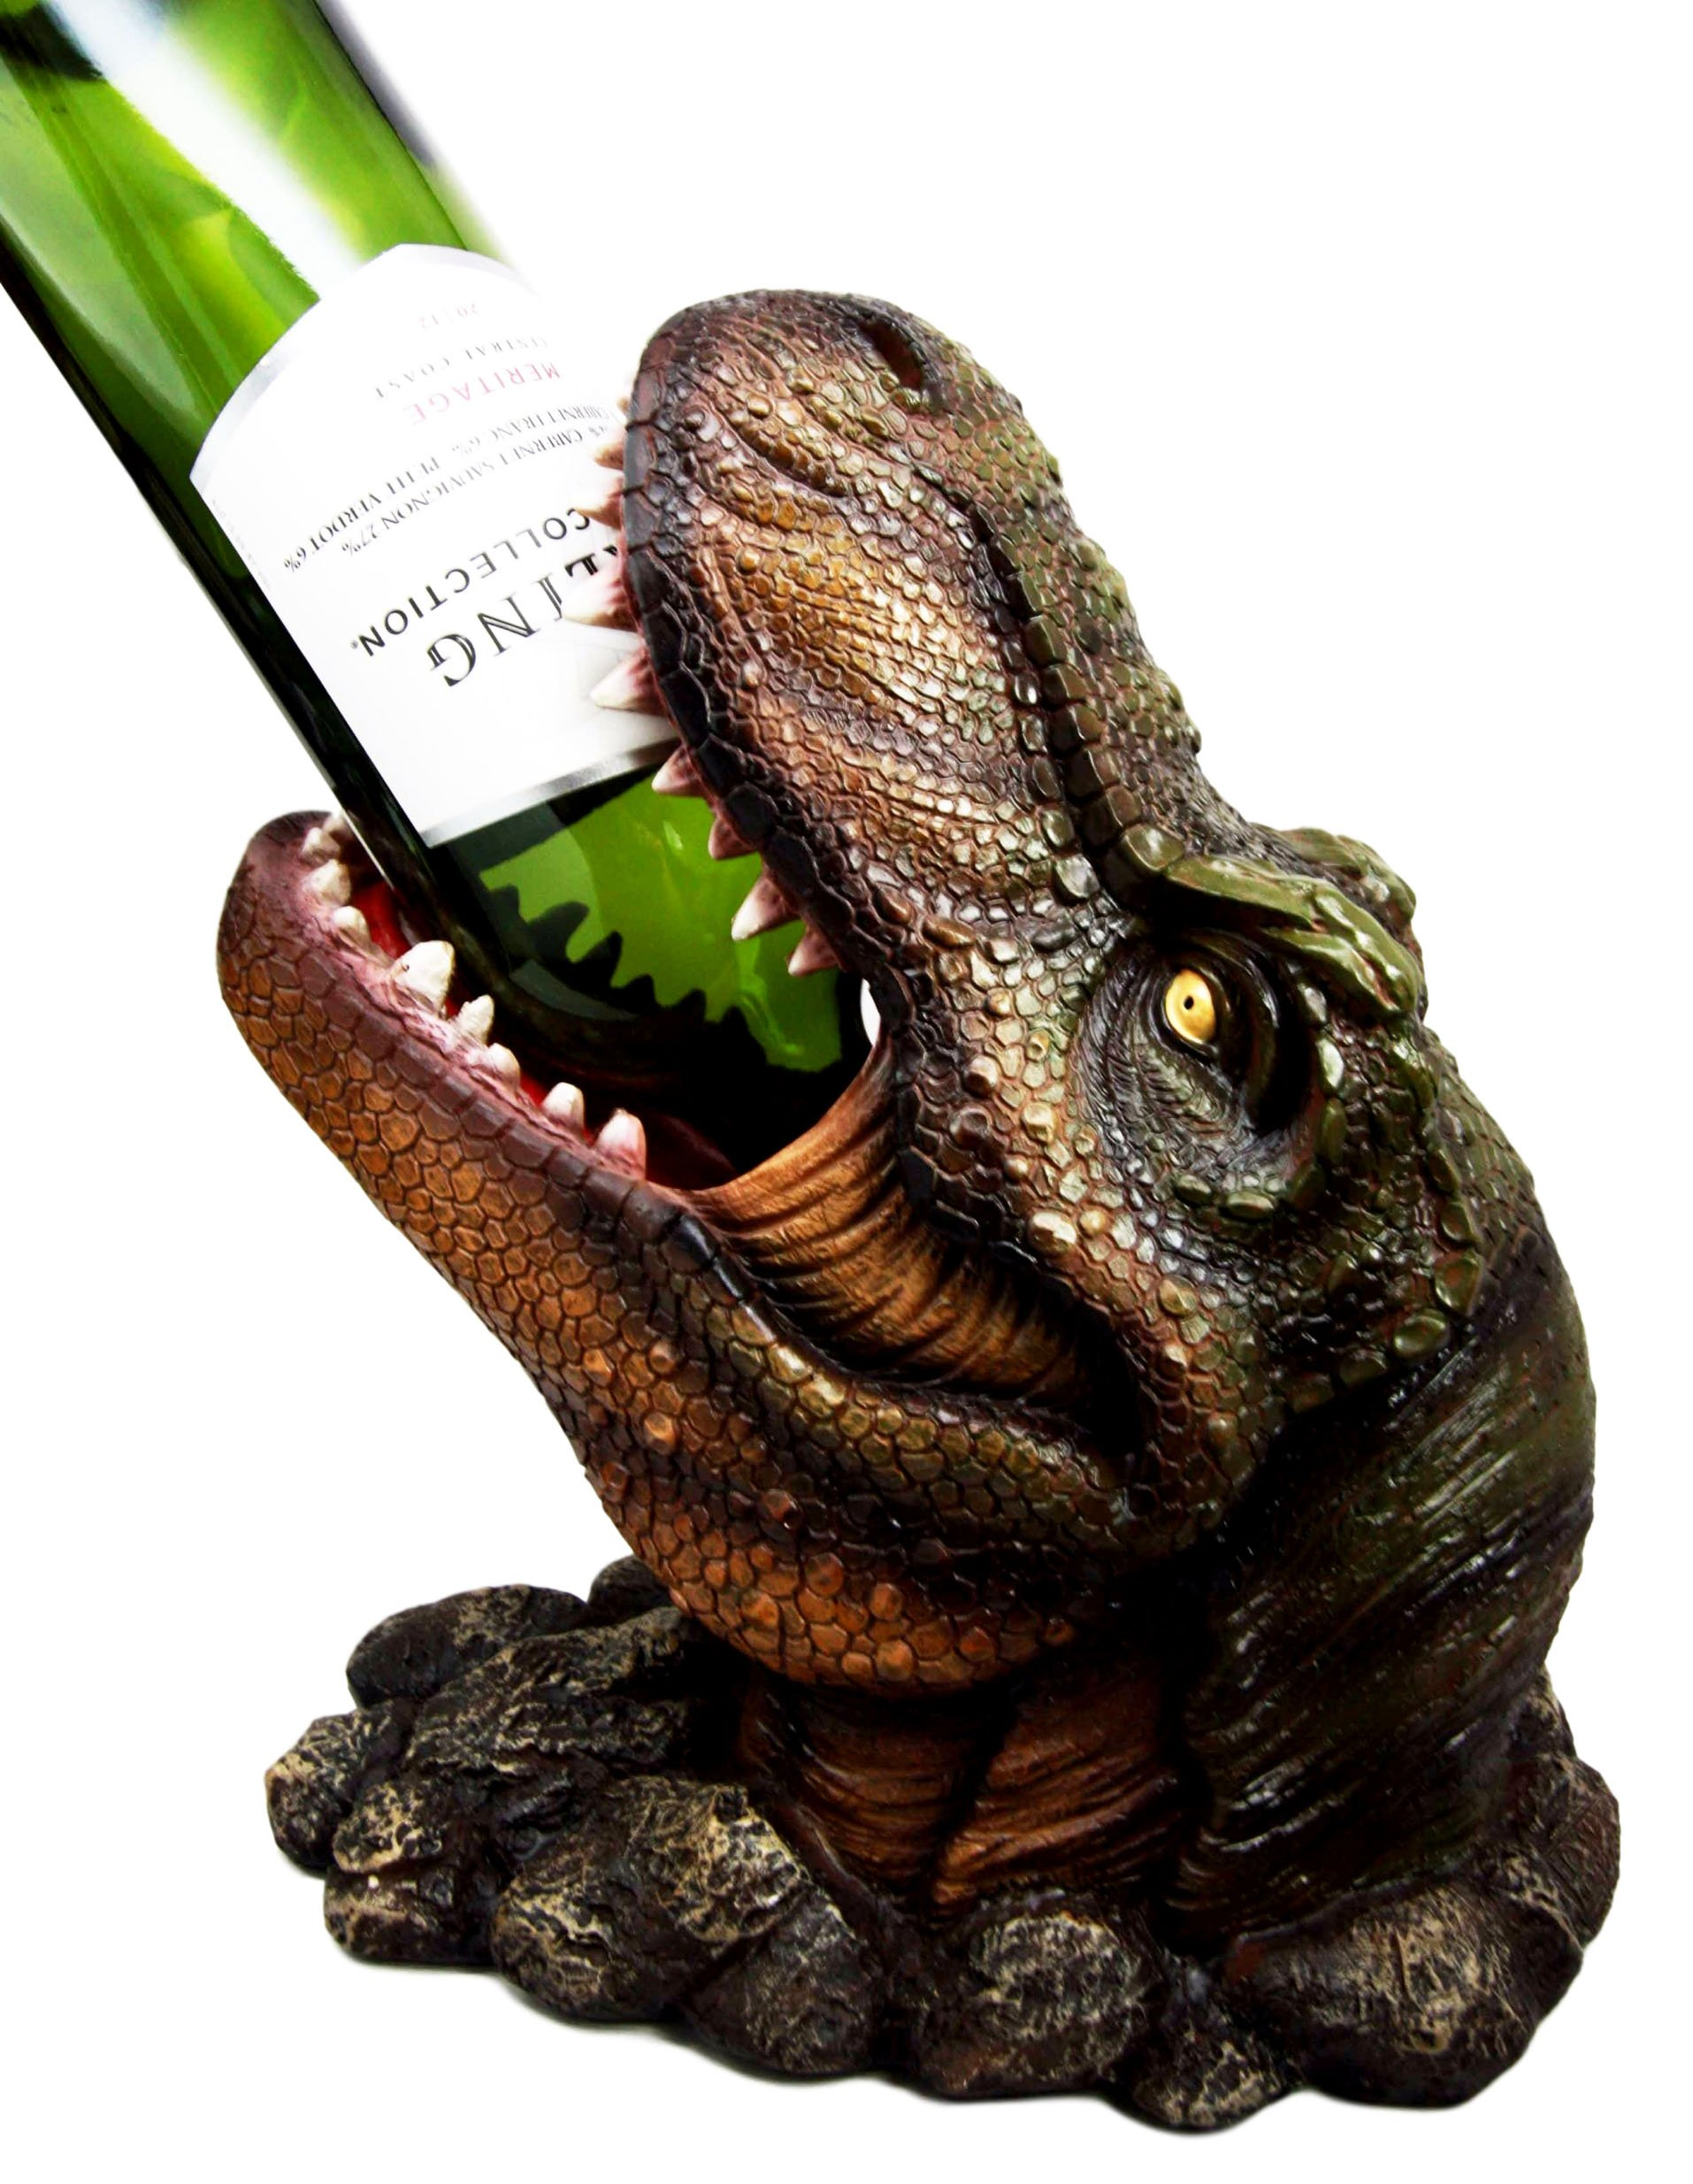 Atlantic Collectibles Prehistoric Dinosaur T-Rex Head 10.75'' Tall Wine Bottle Holder Caddy Figurine